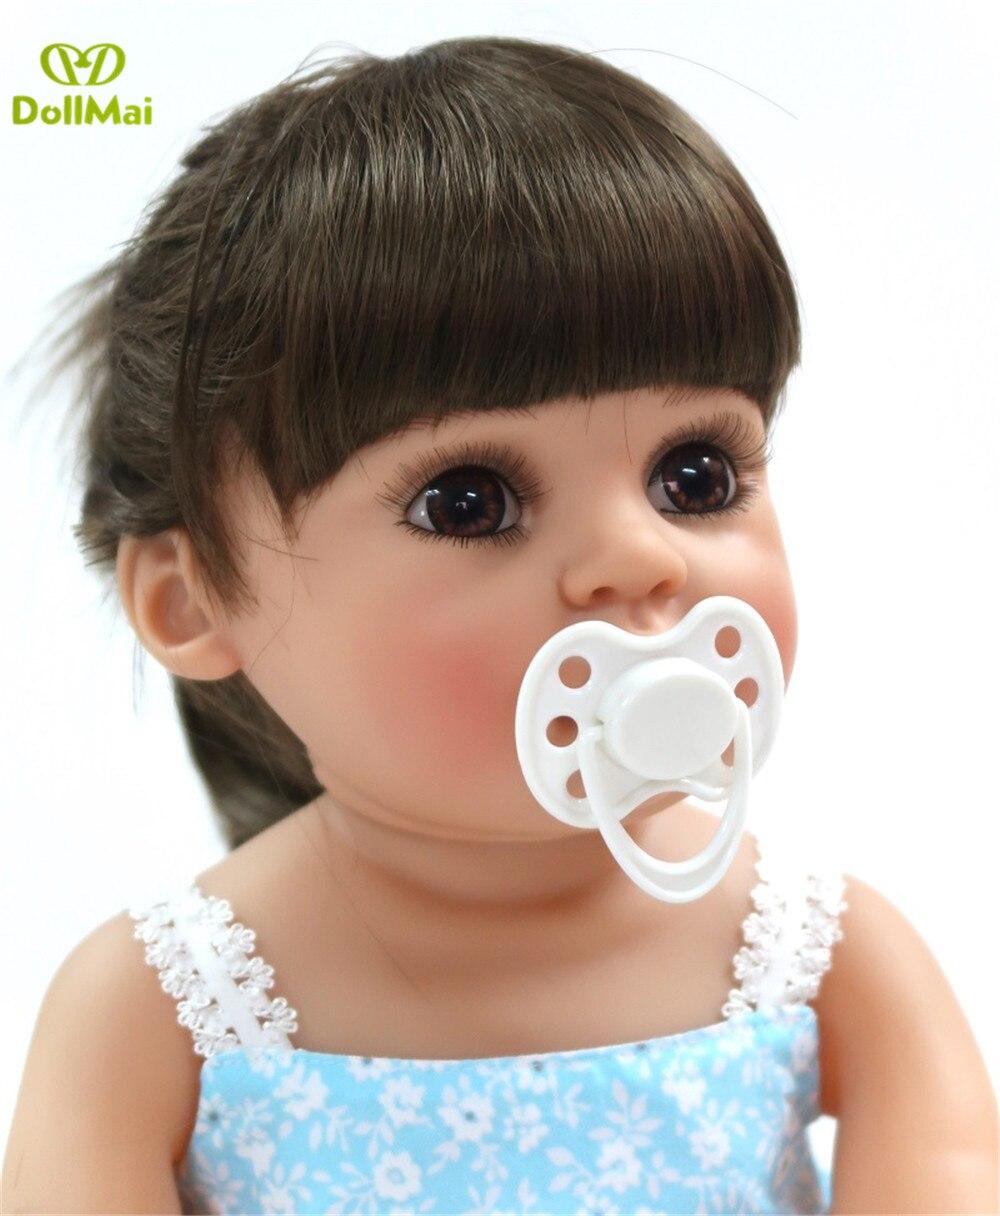 dollmai bebe renascer gemeos menina 56cm cheio 04